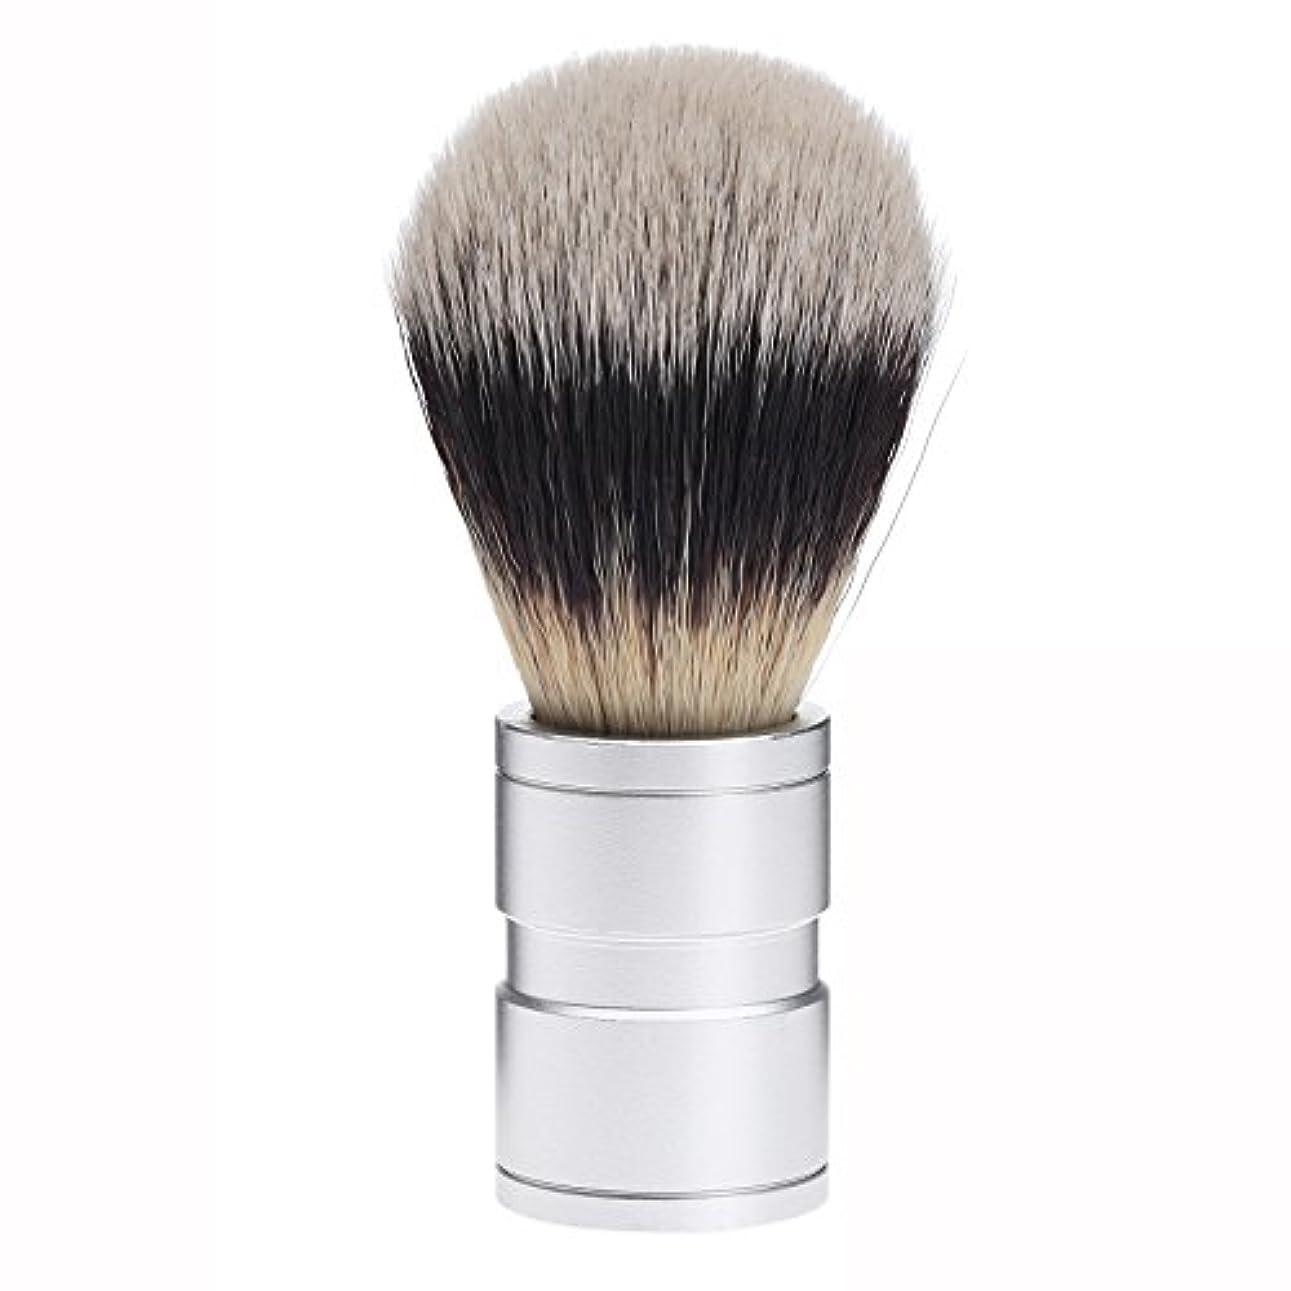 Dophee  シェービング用ブラシ シェービングブラシ メンズ 洗顔ブラシ イミテーションアナグマ毛 ファイン模倣 理容 洗顔 髭剃り